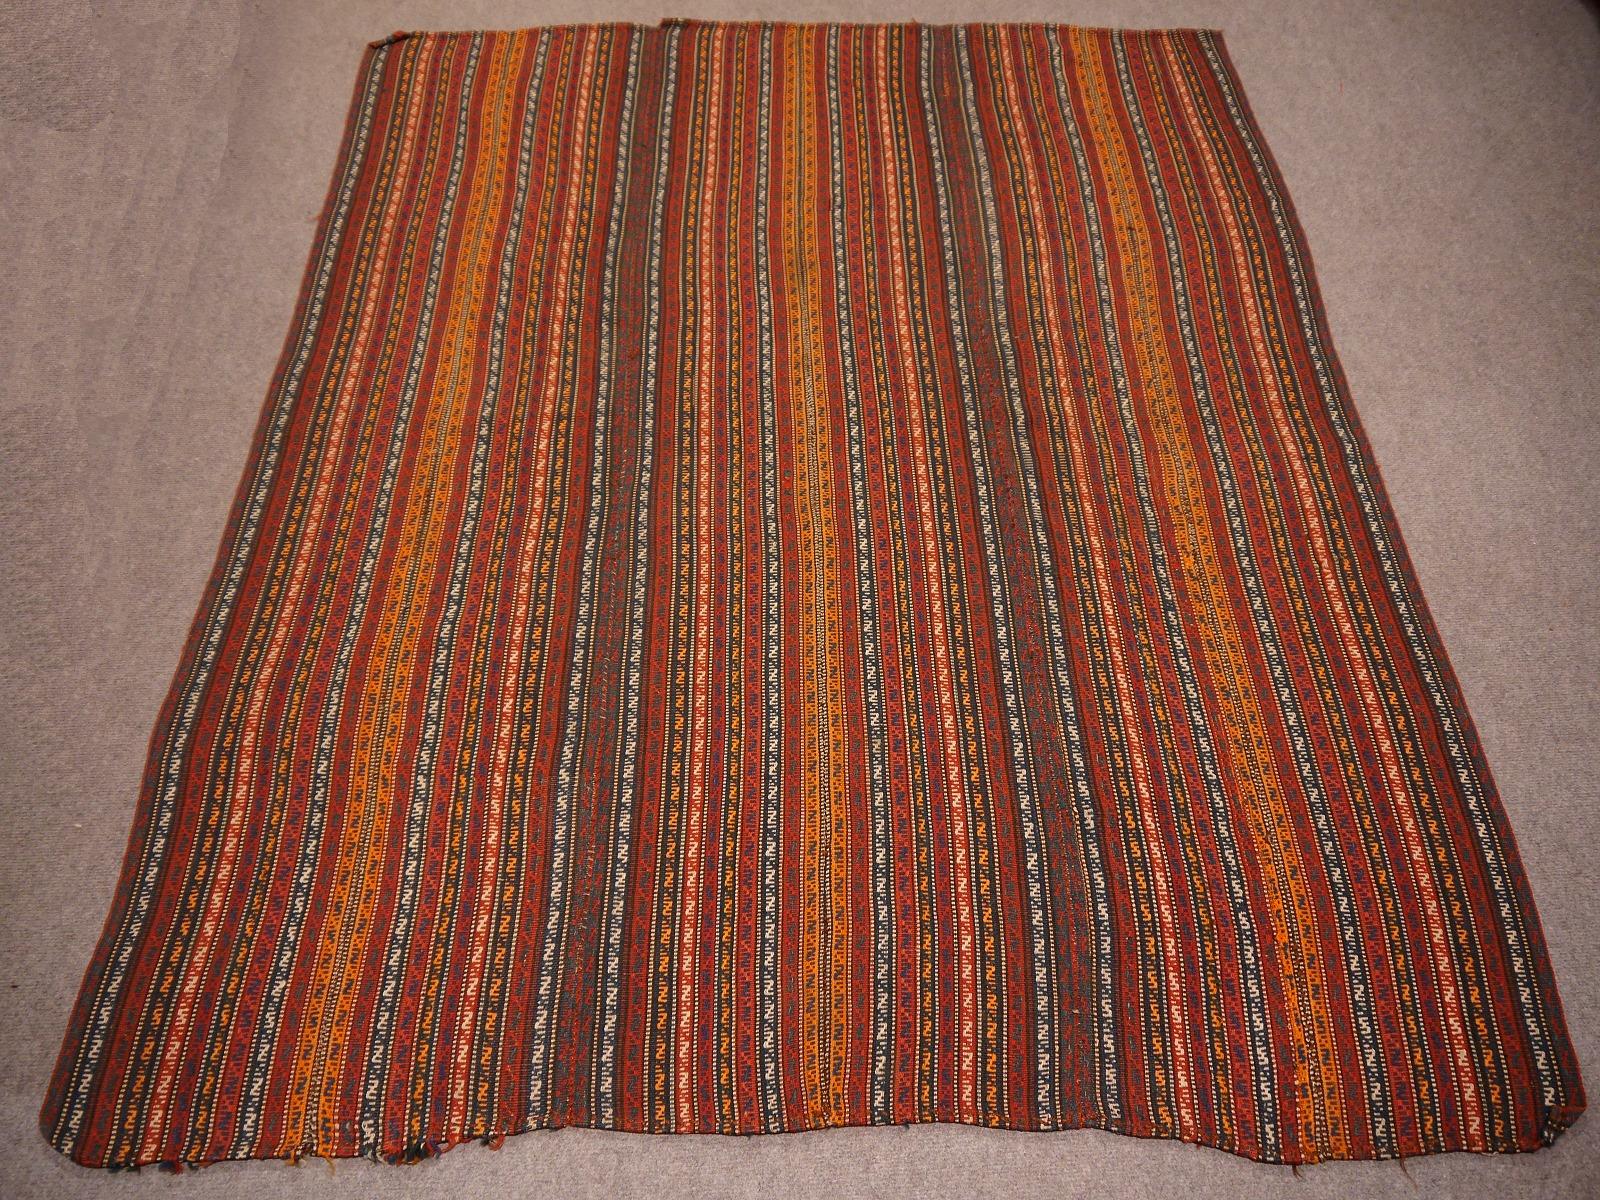 12137 jajim vintage rug iran persia 5 8 x 5 4 ft 177 x 165 cm. Black Bedroom Furniture Sets. Home Design Ideas